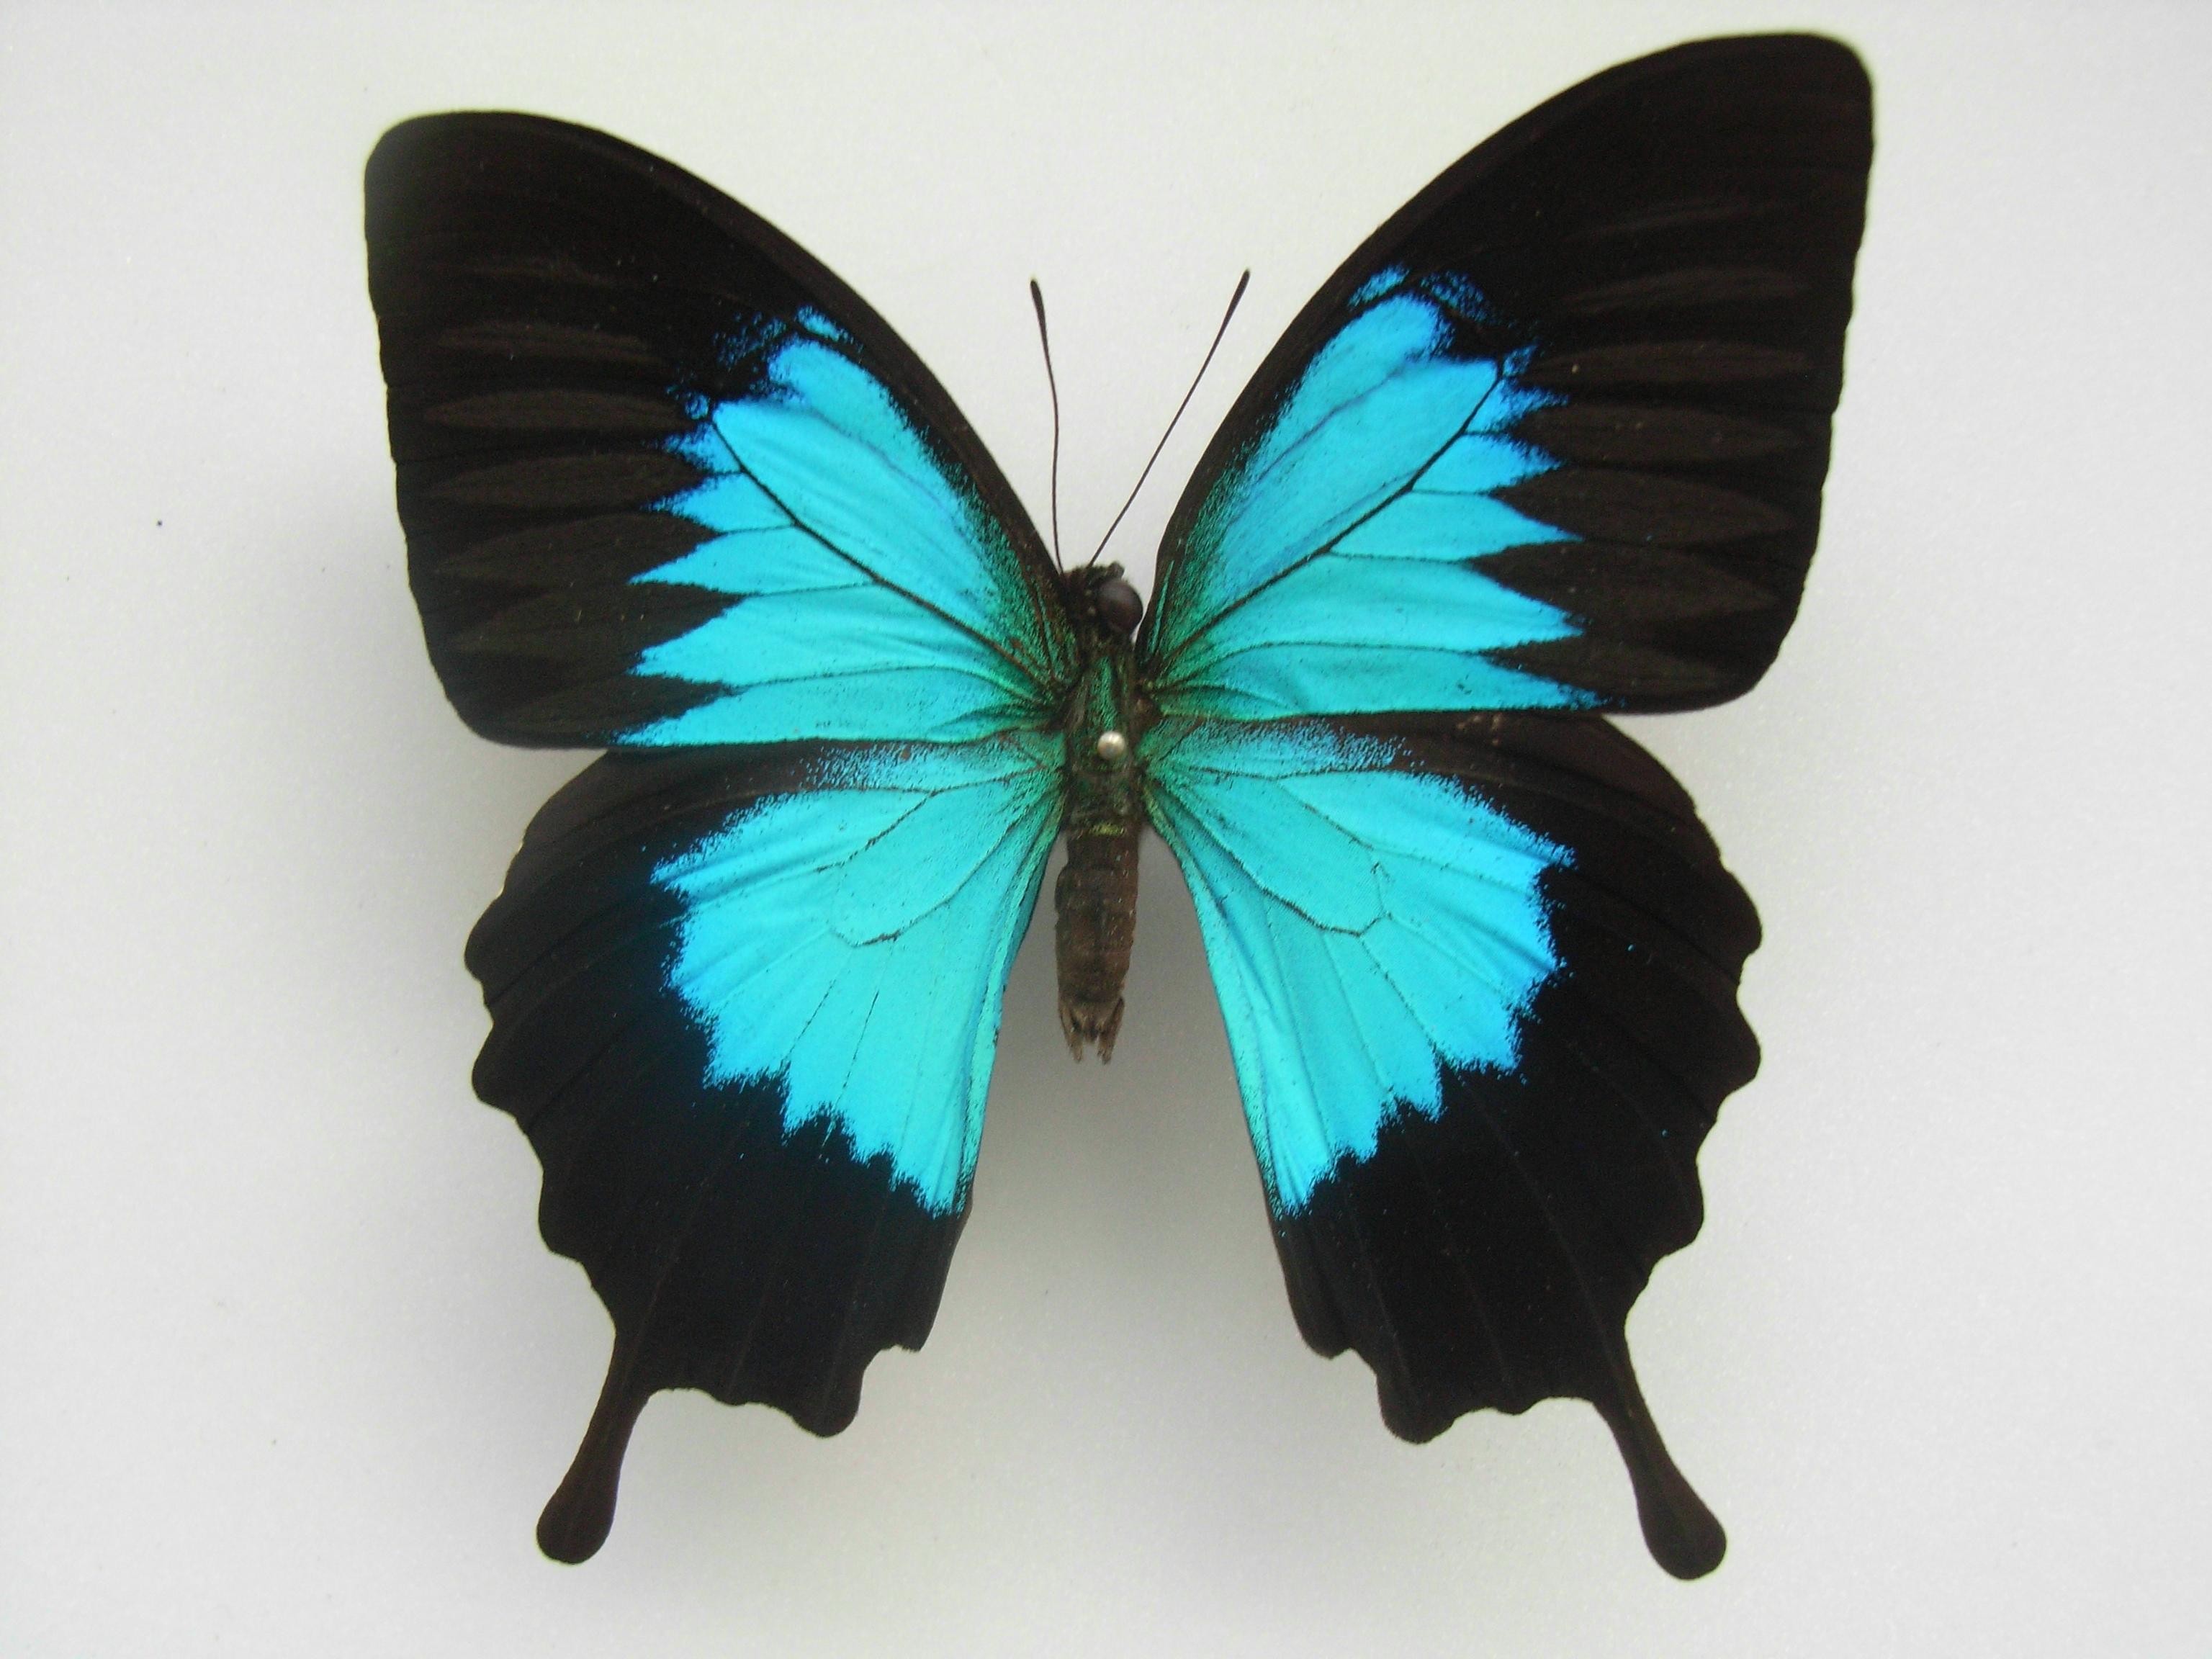 Blue Swallowtail Butterfly HD Wallpaper Animals Wallpapers 3072x2304